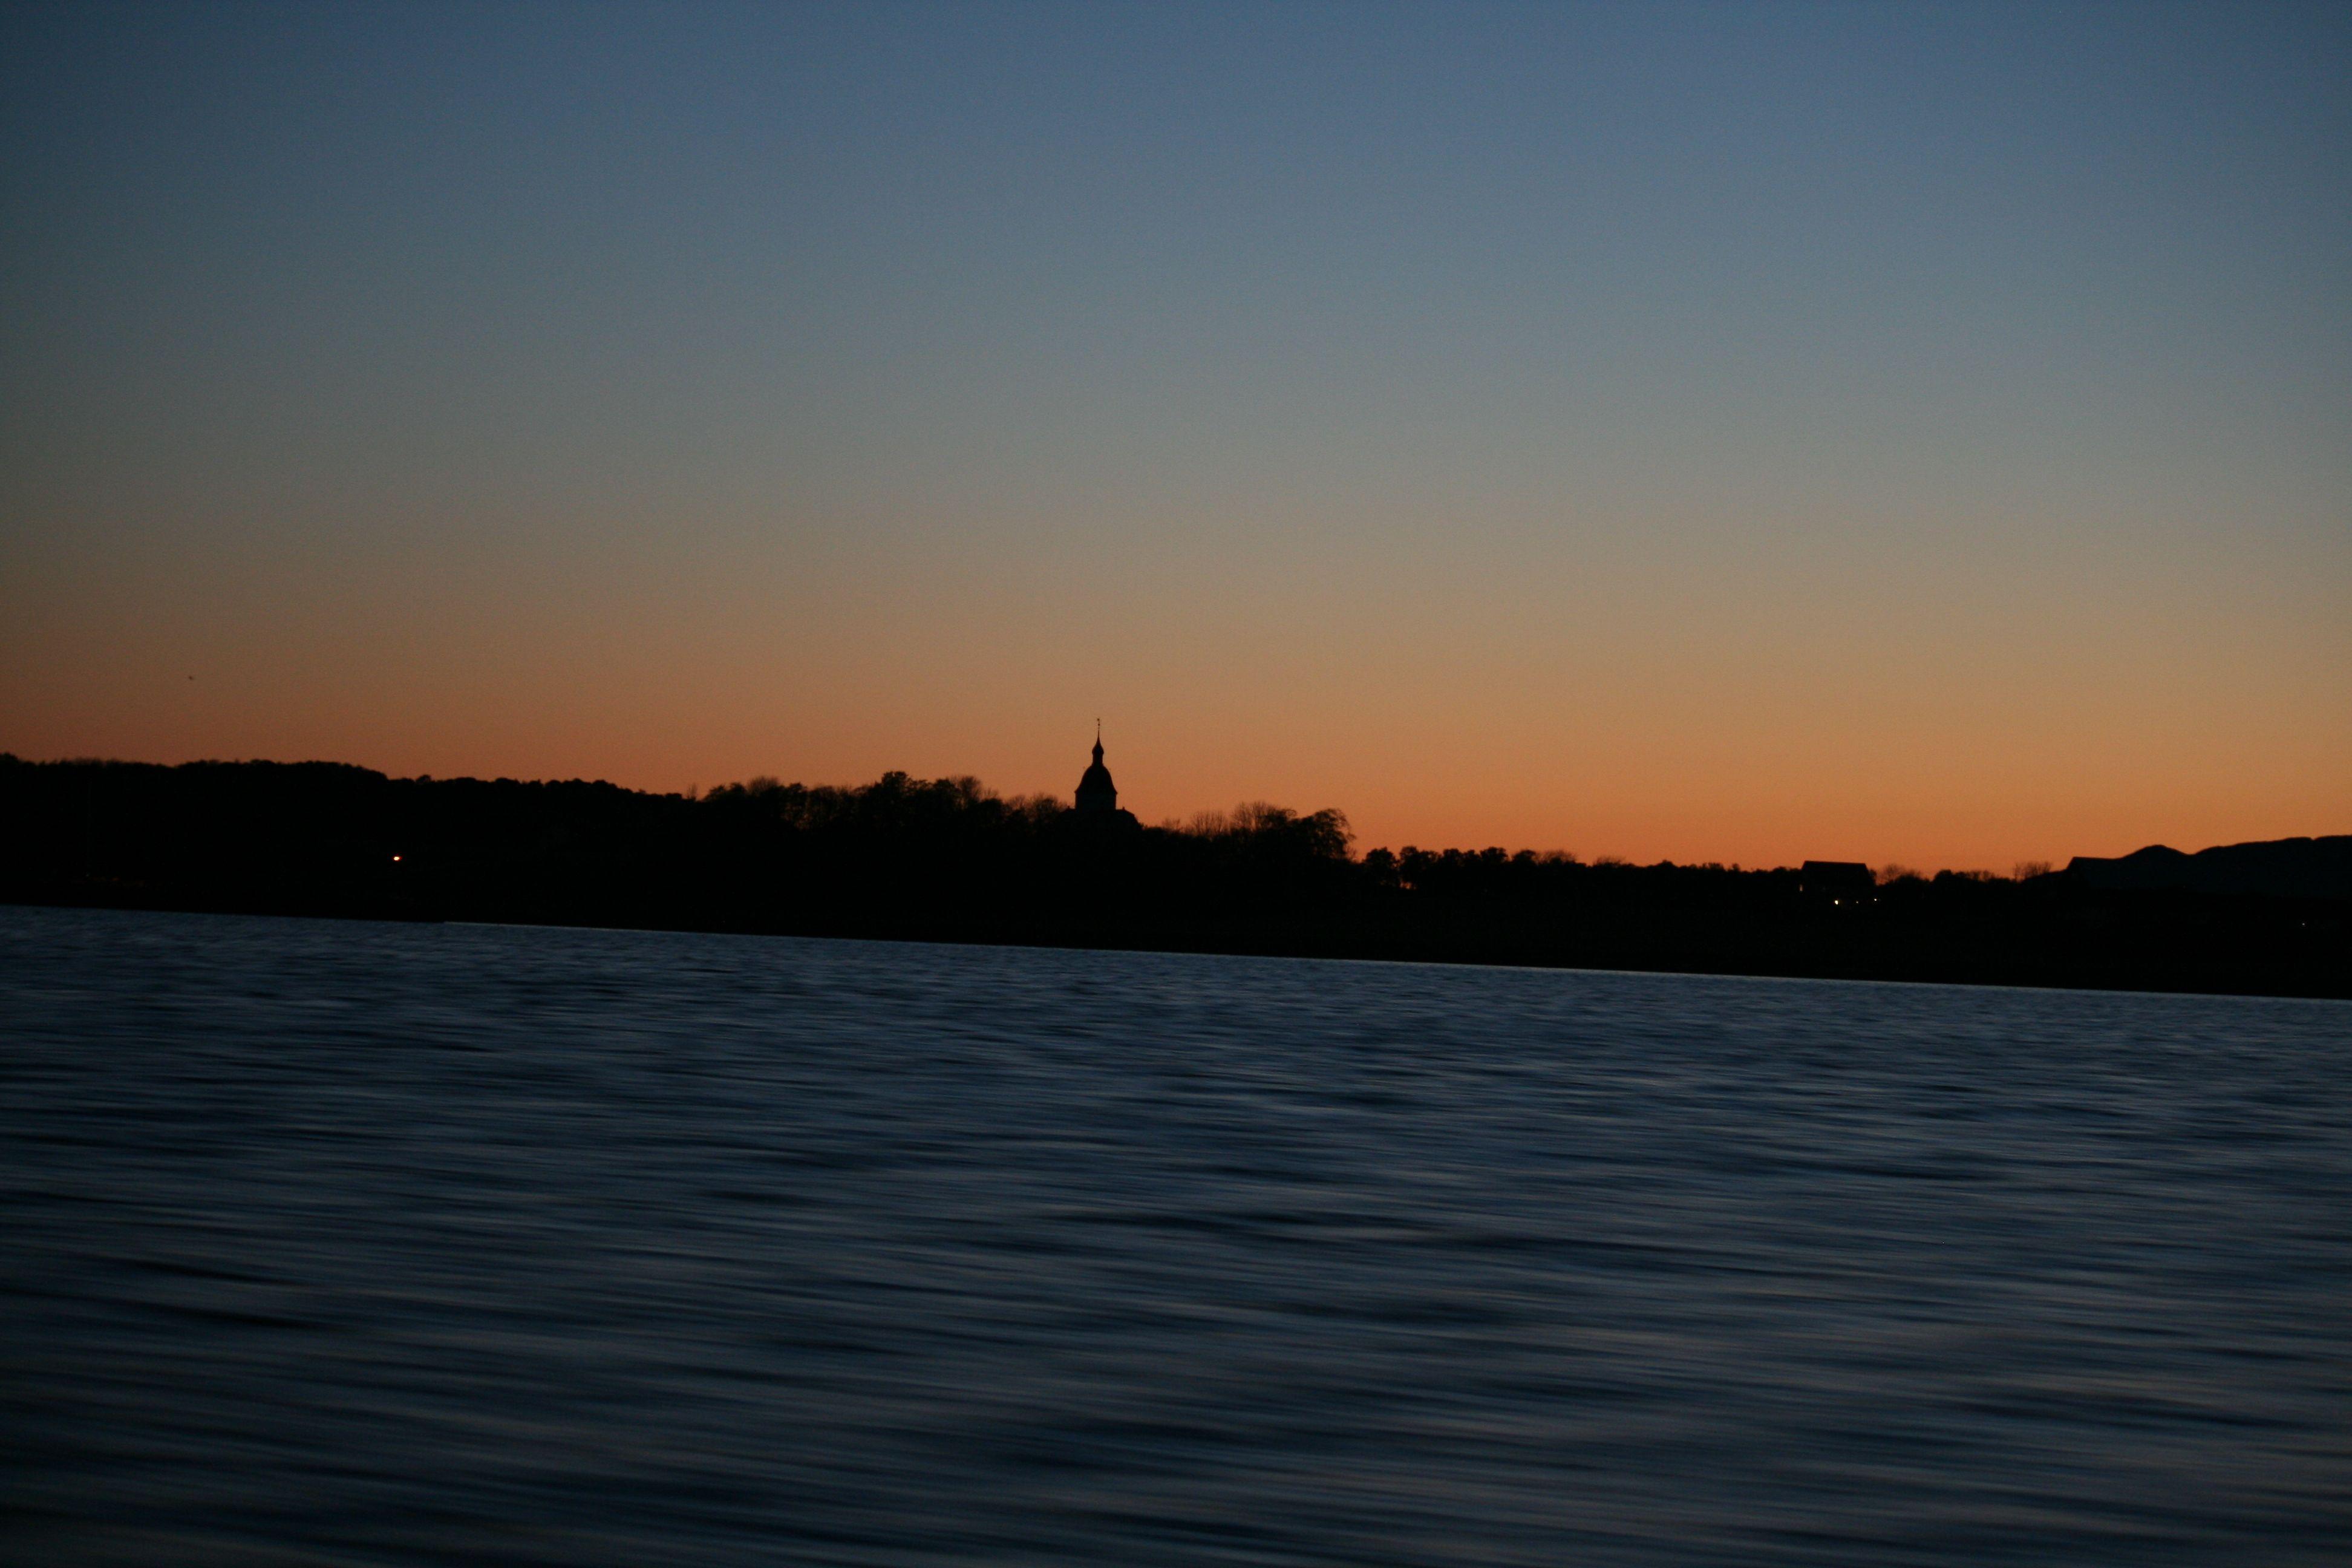 Norway Fosen, at midnight.